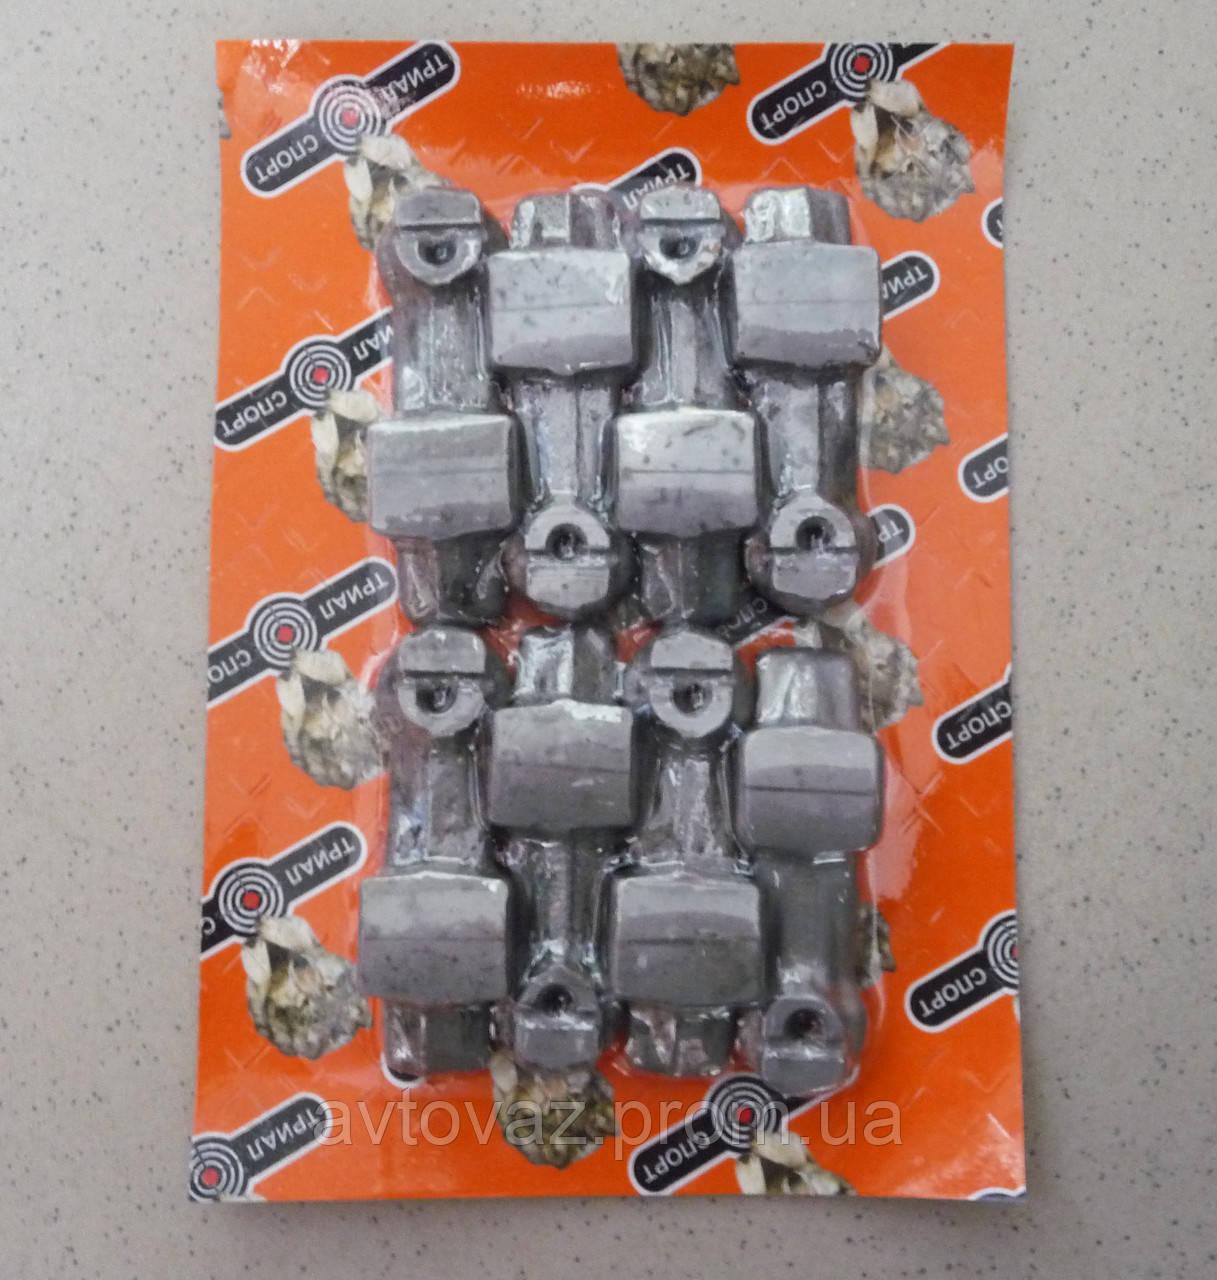 Рычаг клапана, рокера  ВАЗ 2101, ВАЗ 2106, ВАЗ 2107, ВАЗ 21214, ВАЗ 2123 Нива С/О (Триал-Спорт)